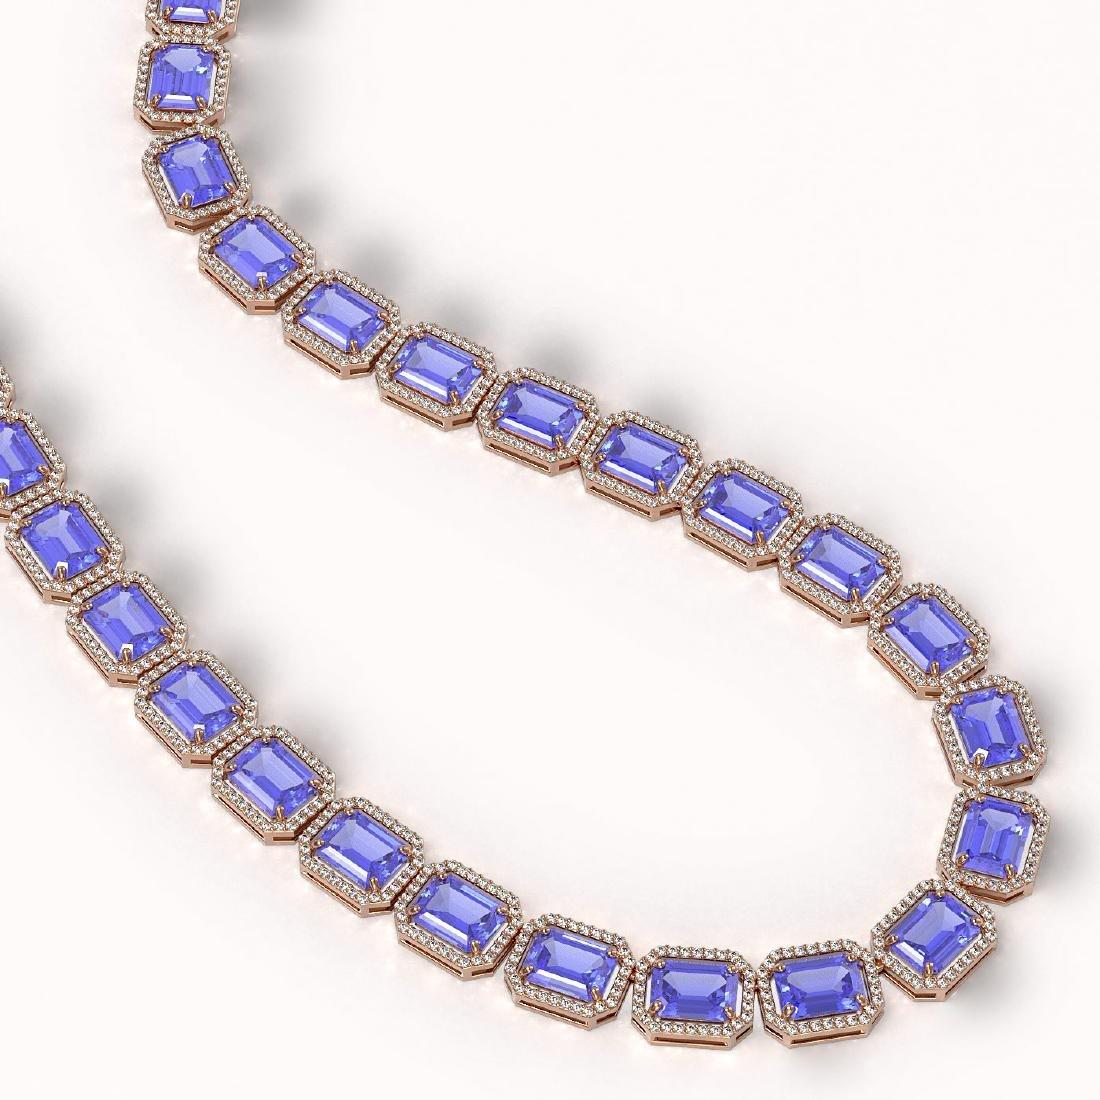 79.99 CTW Tanzanite & Diamond Halo Necklace 10K Rose - 2